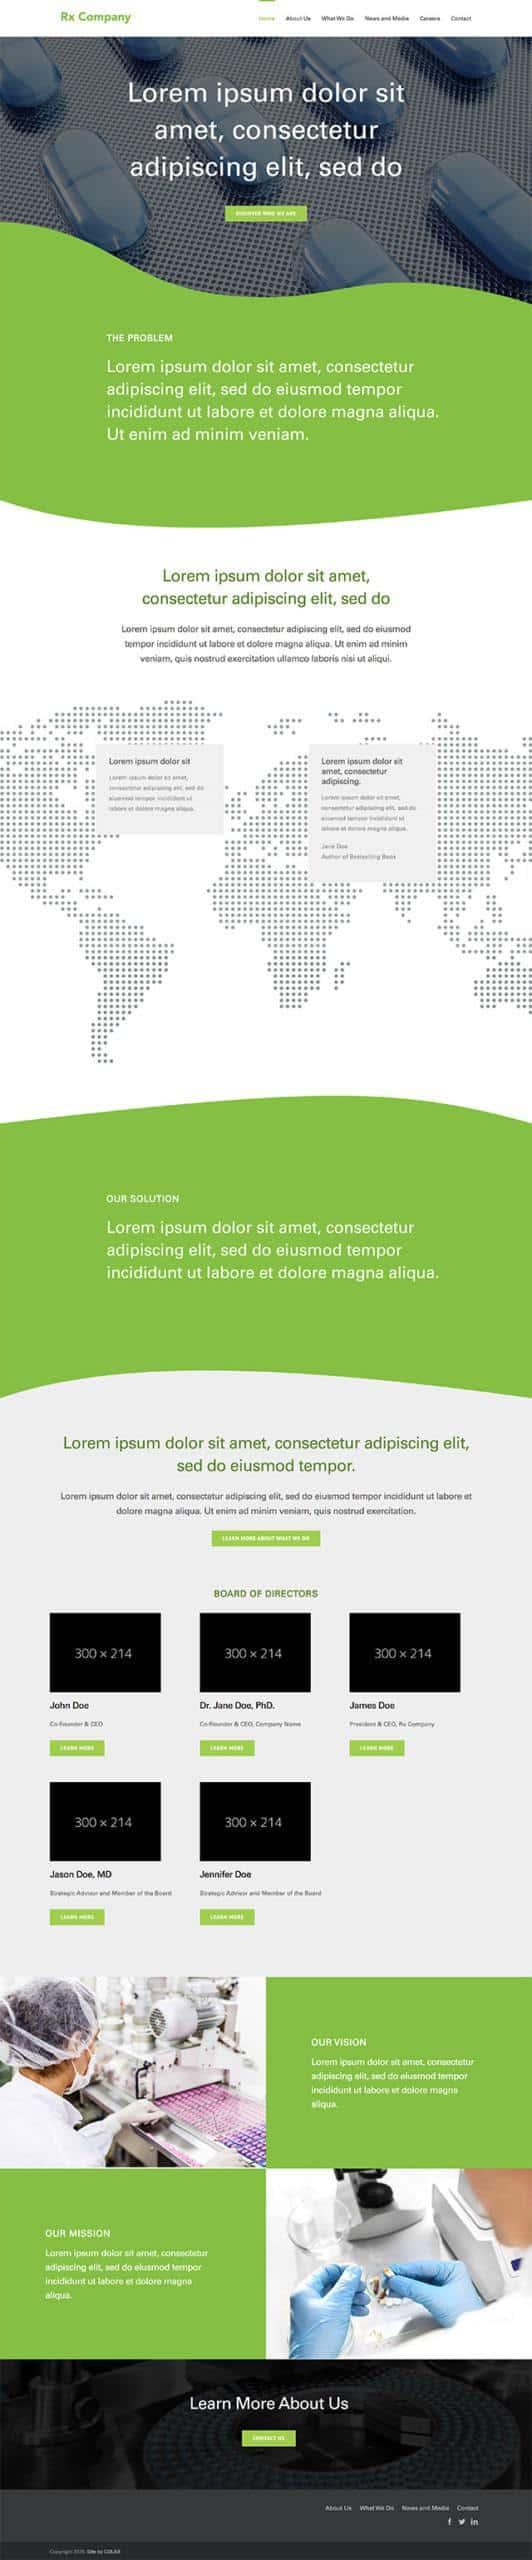 Rx Company Homepage